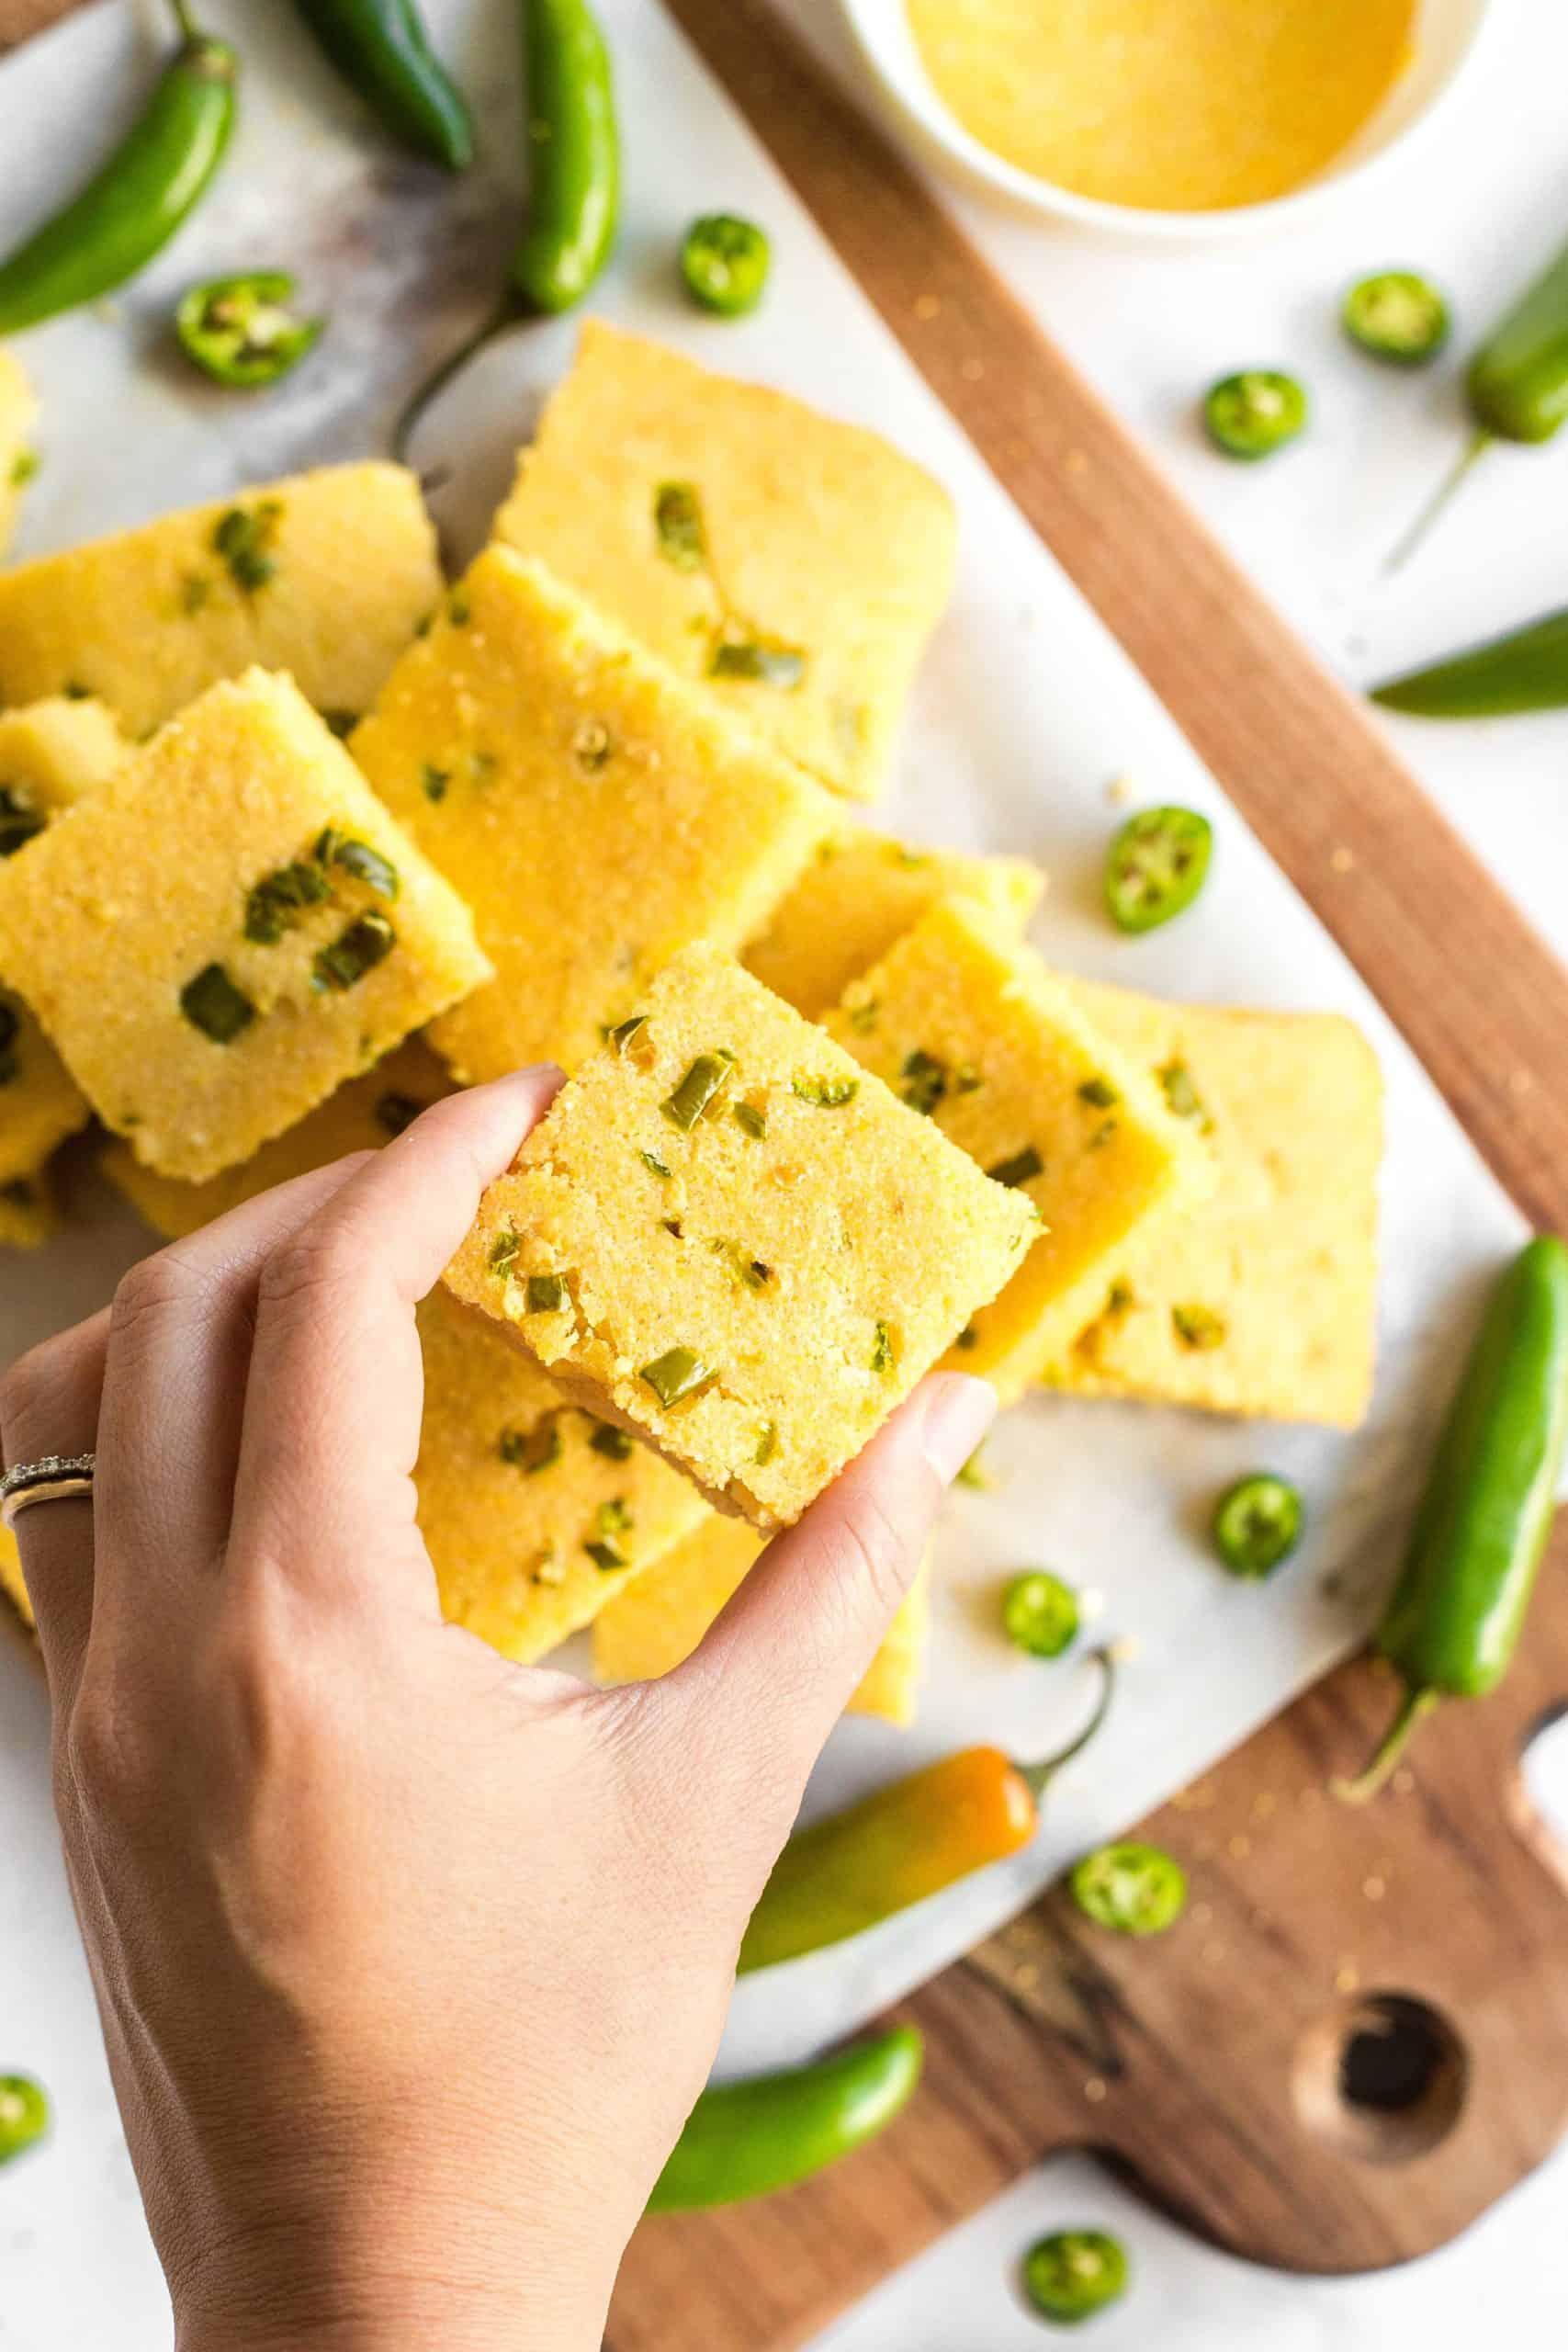 A hand holding up a piece of gluten-free jalapeño cornbread.